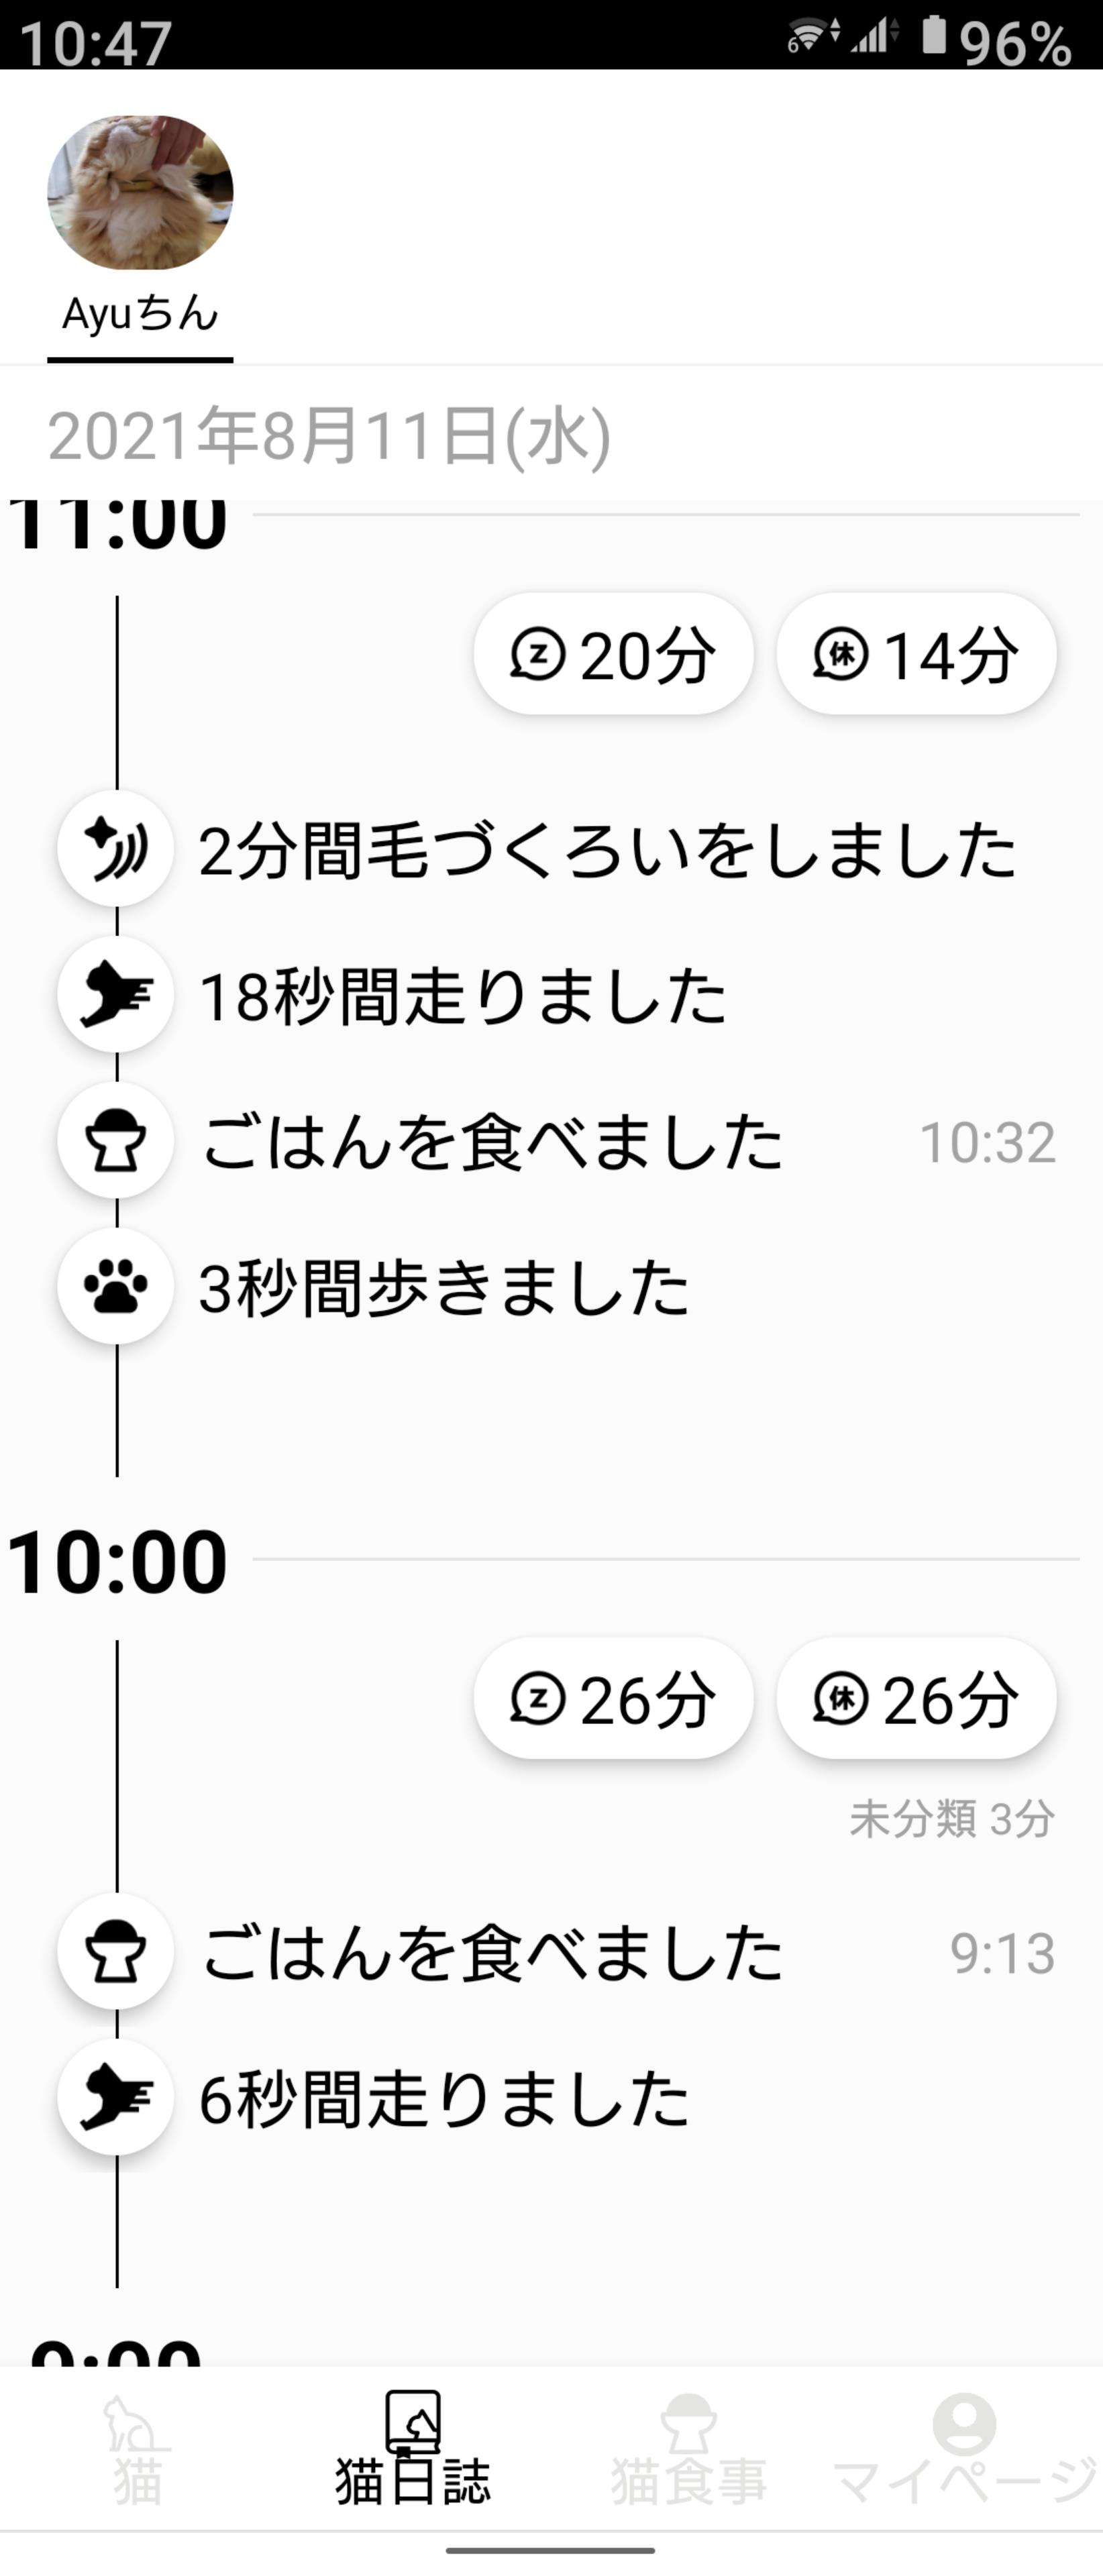 Screenshot_20210811-104740.png